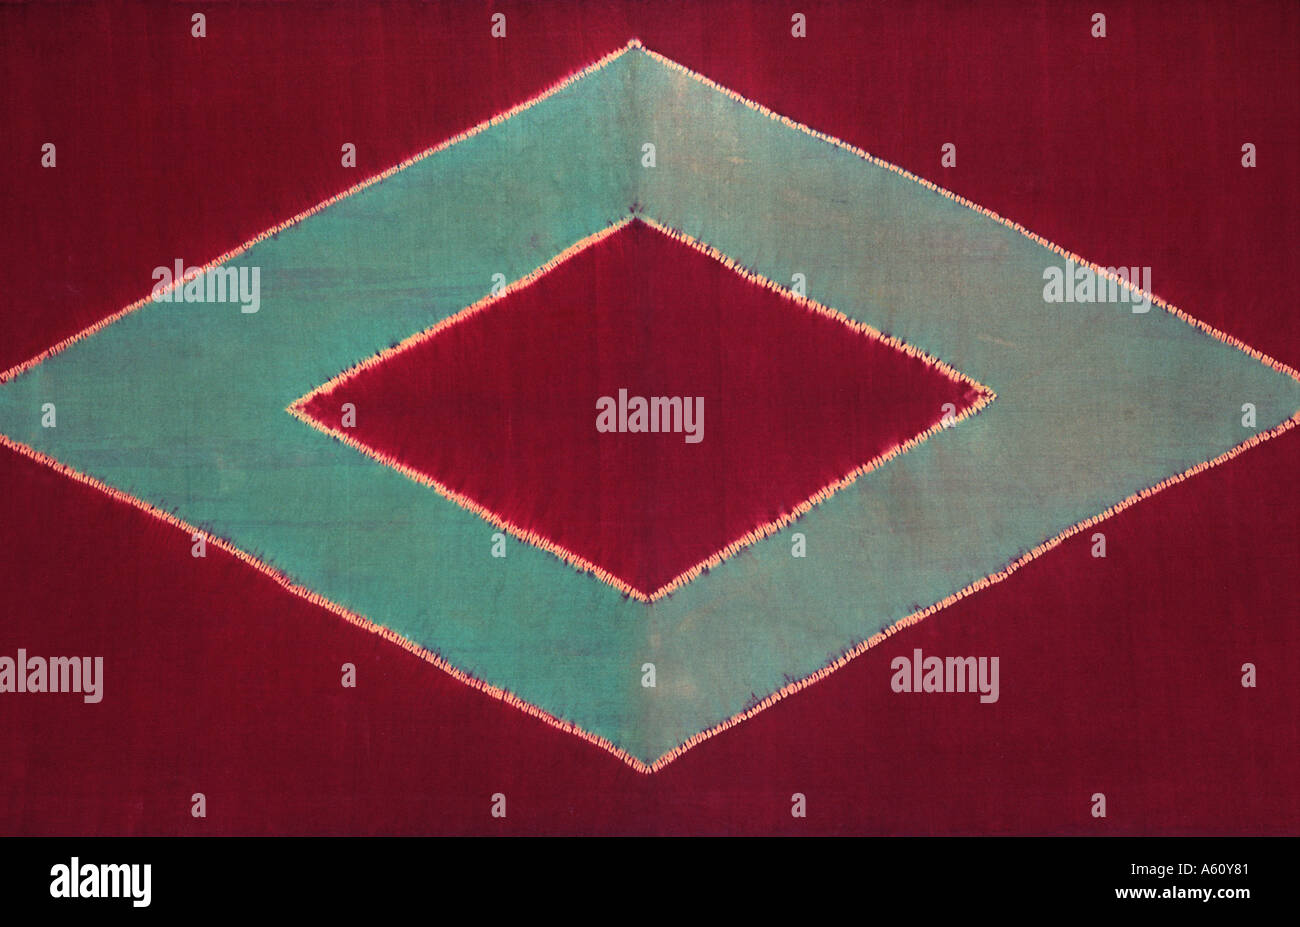 Ceremonial cloth and sacred heirloom Dodot Silk batik from Java or Sumatra Indonesia - Stock Image